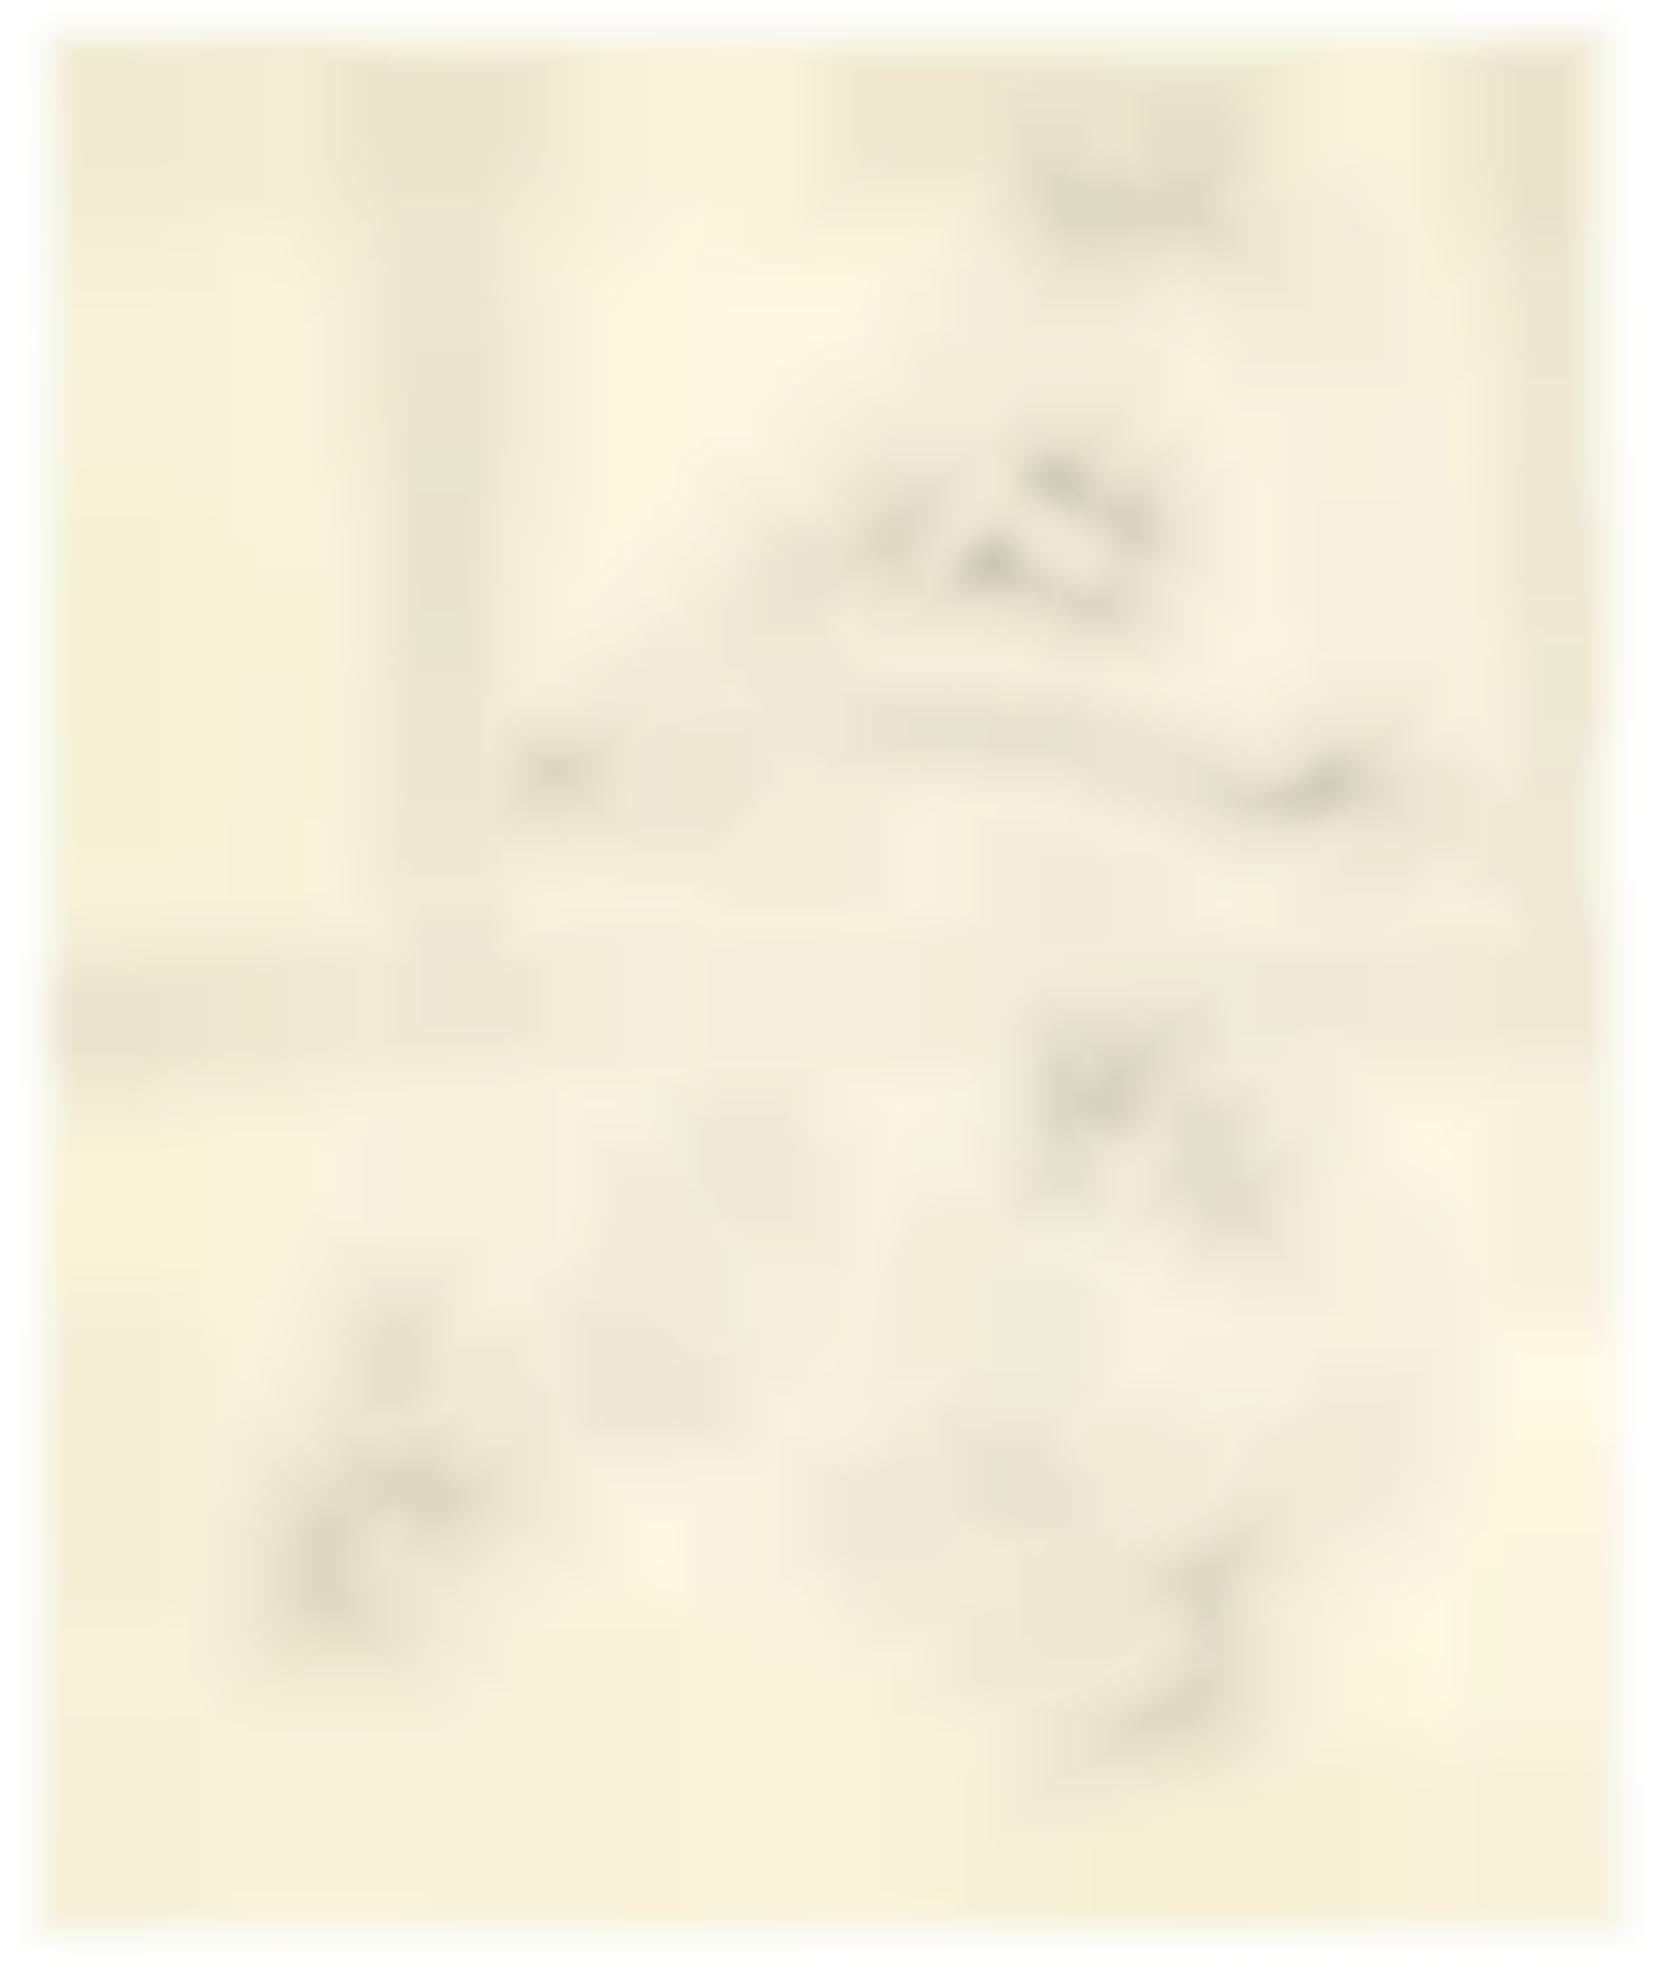 Lucian Freud-Figure Studies-1940